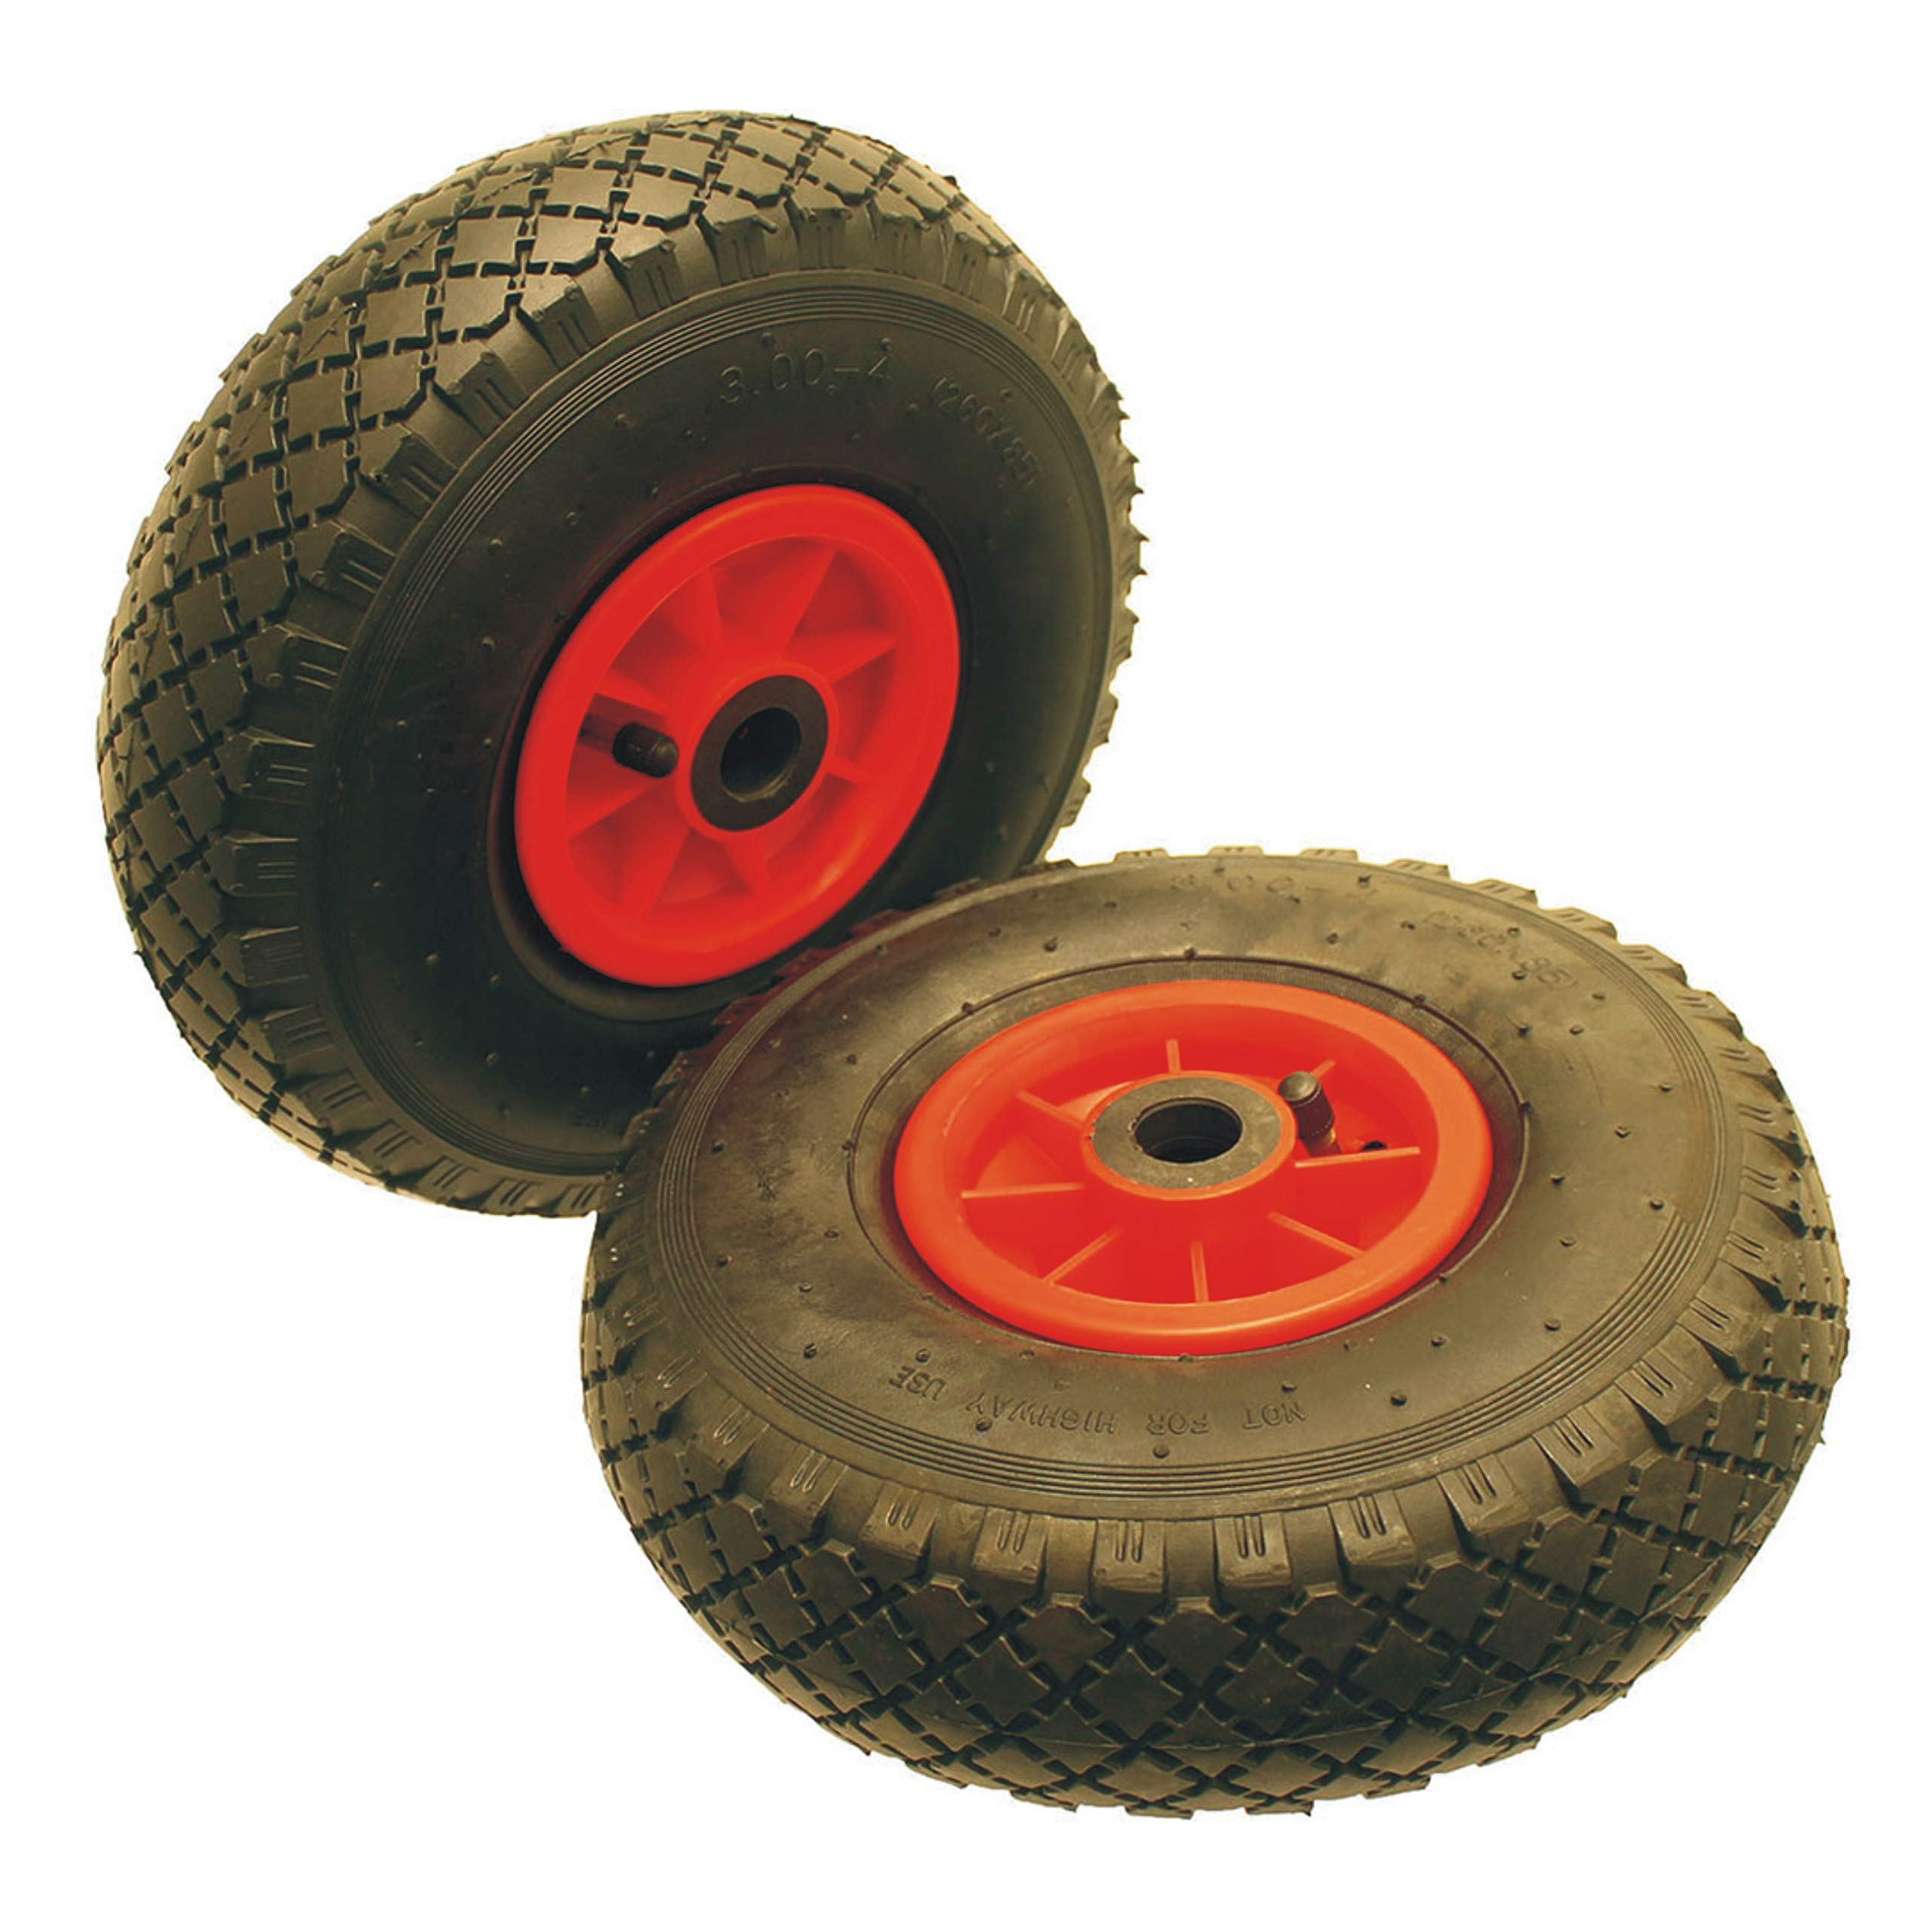 Heavy Duty 10 Pneumatic Needle Bearing Wheel Spare//Replacement Trolley Truck Wheelbarrow